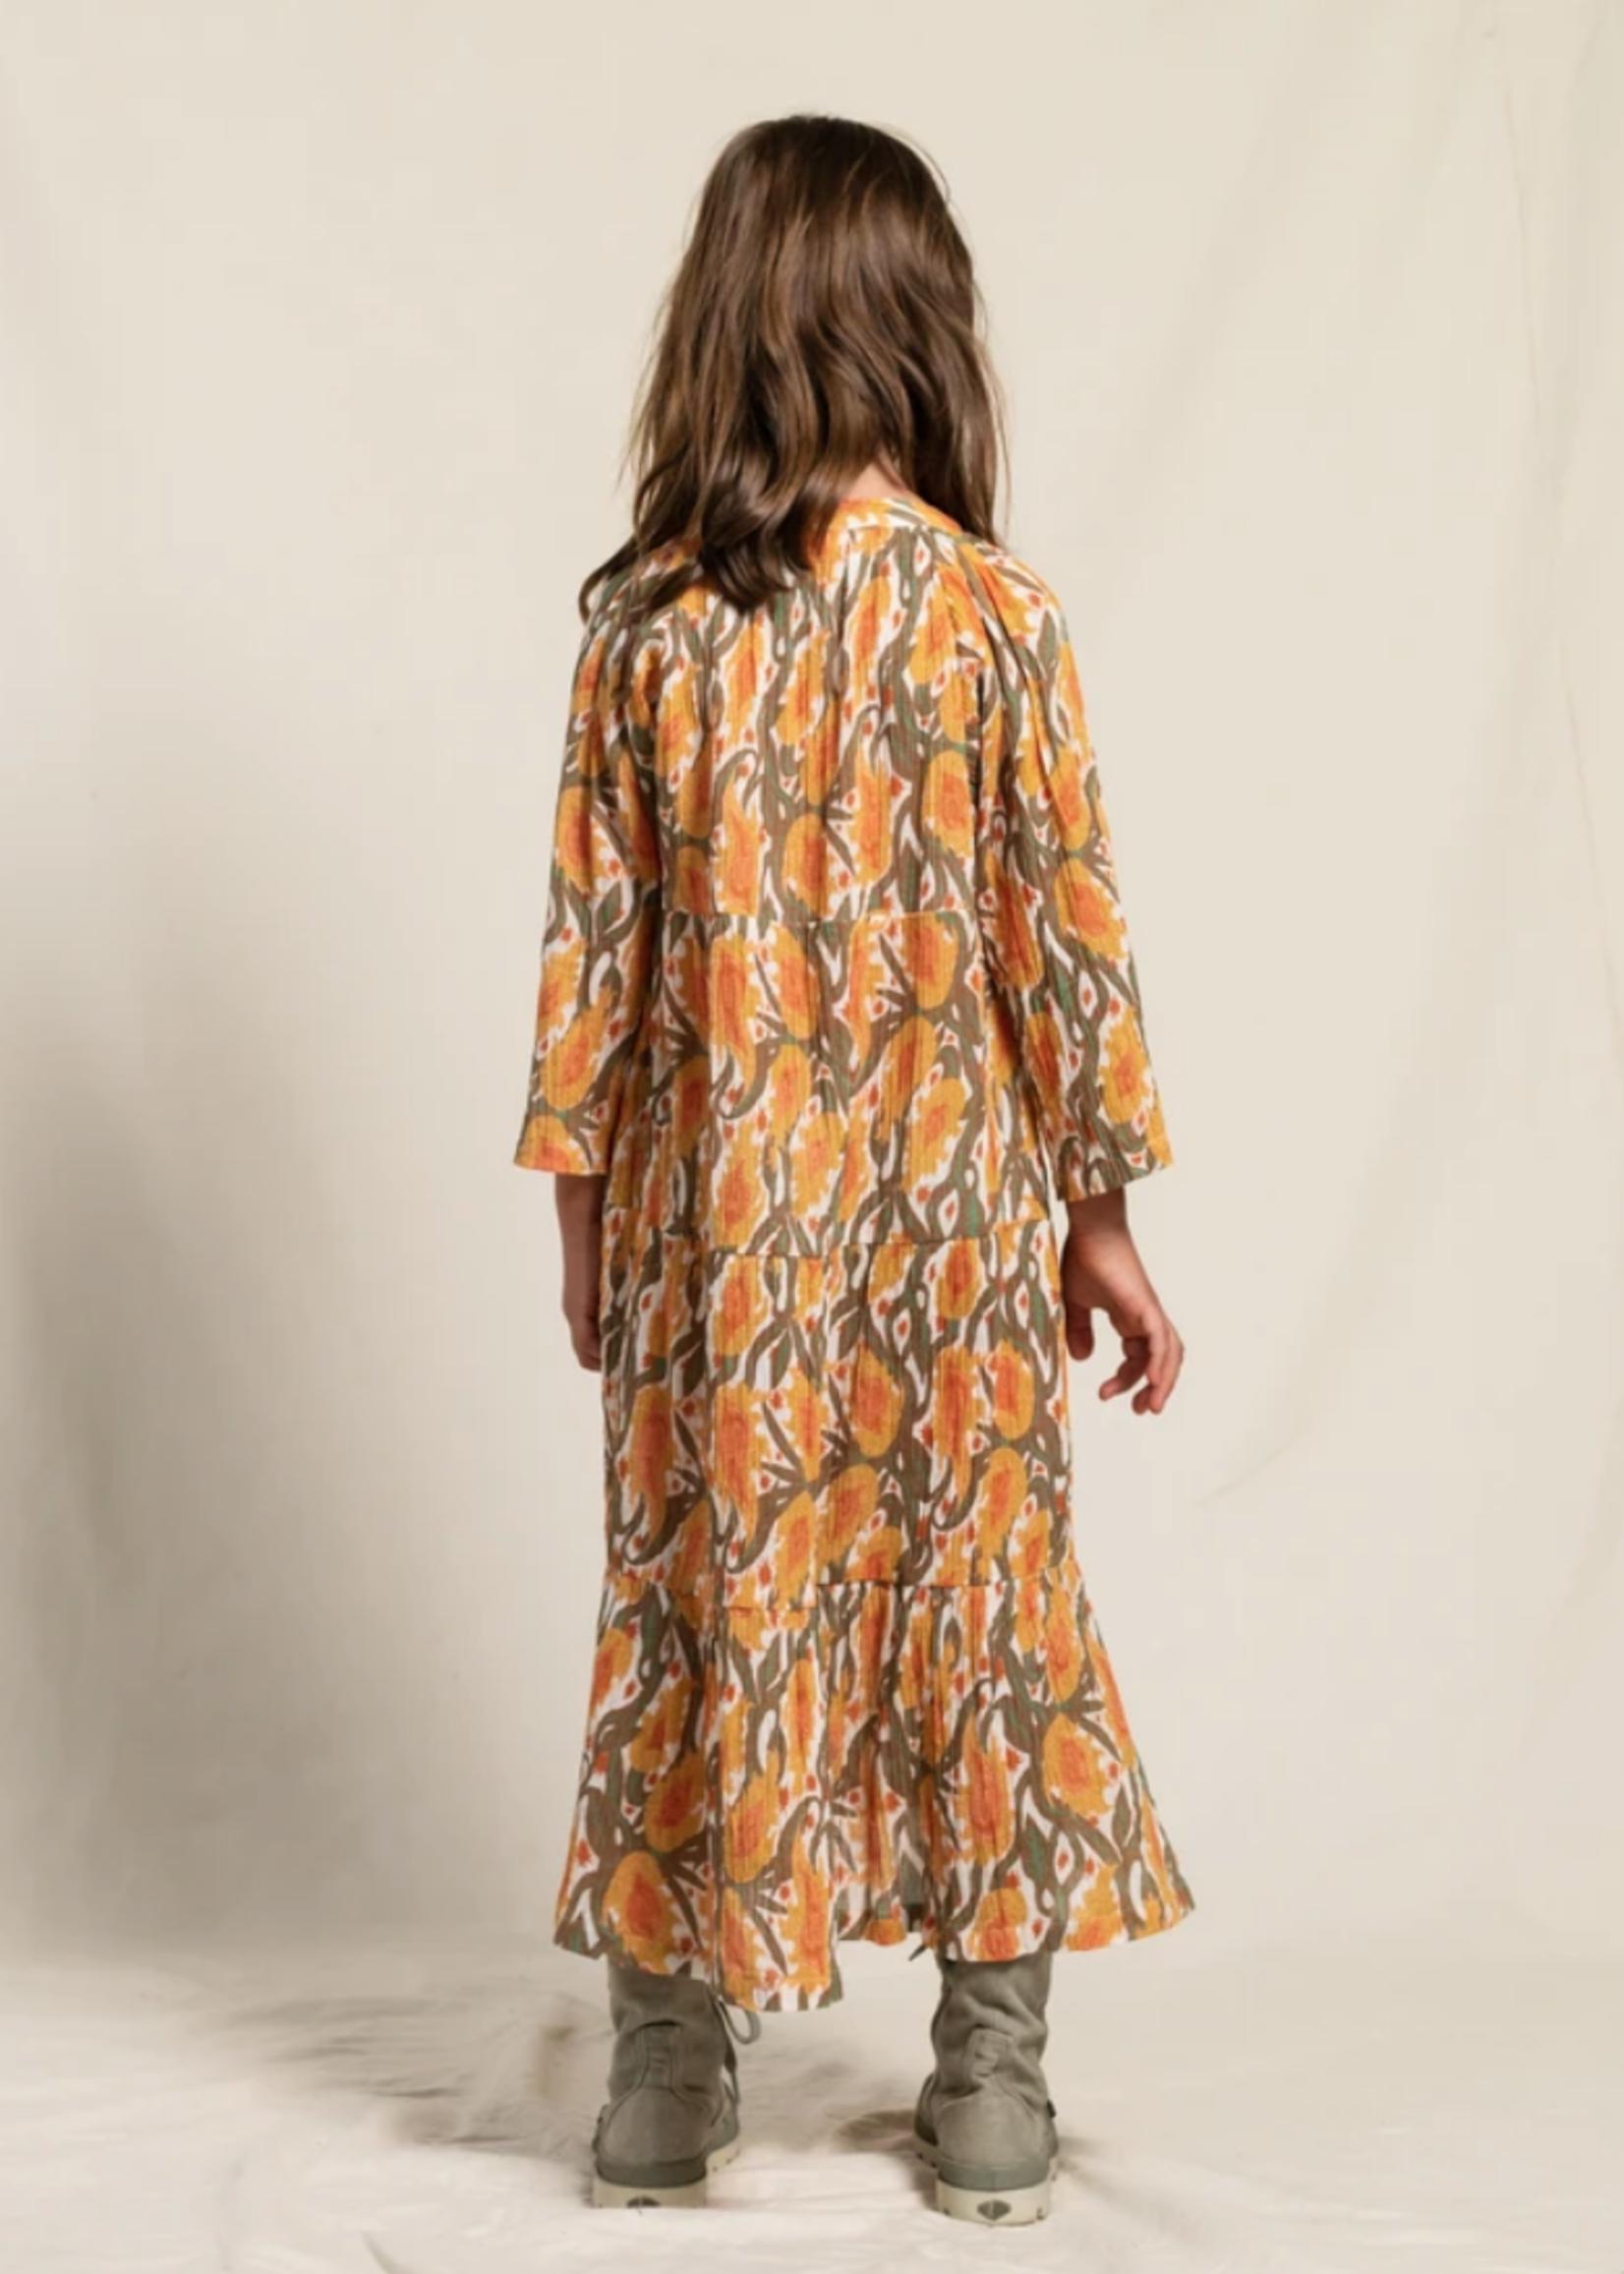 FINGER IN THE NOSE ROSABEACH Peach Iris - Long Beach Dress